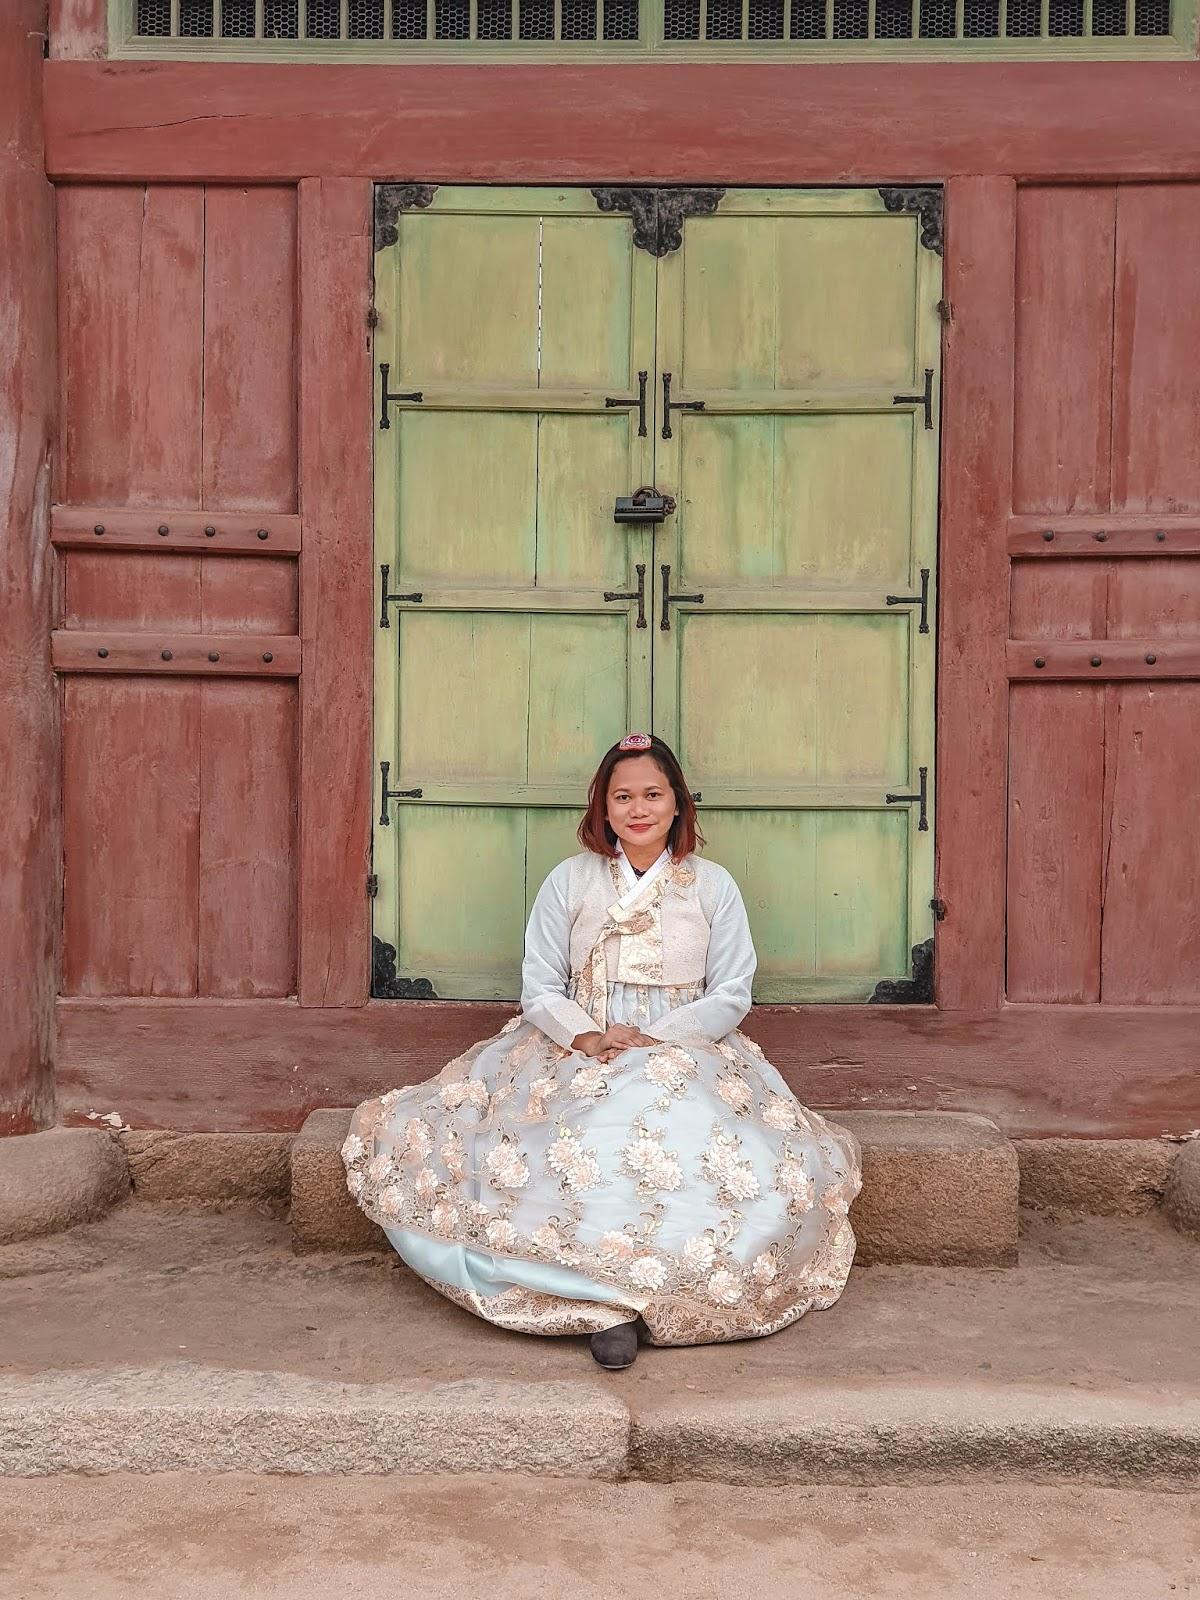 #AutumnInKorea: Hanbok Experience at Gyeongbokgung Palace